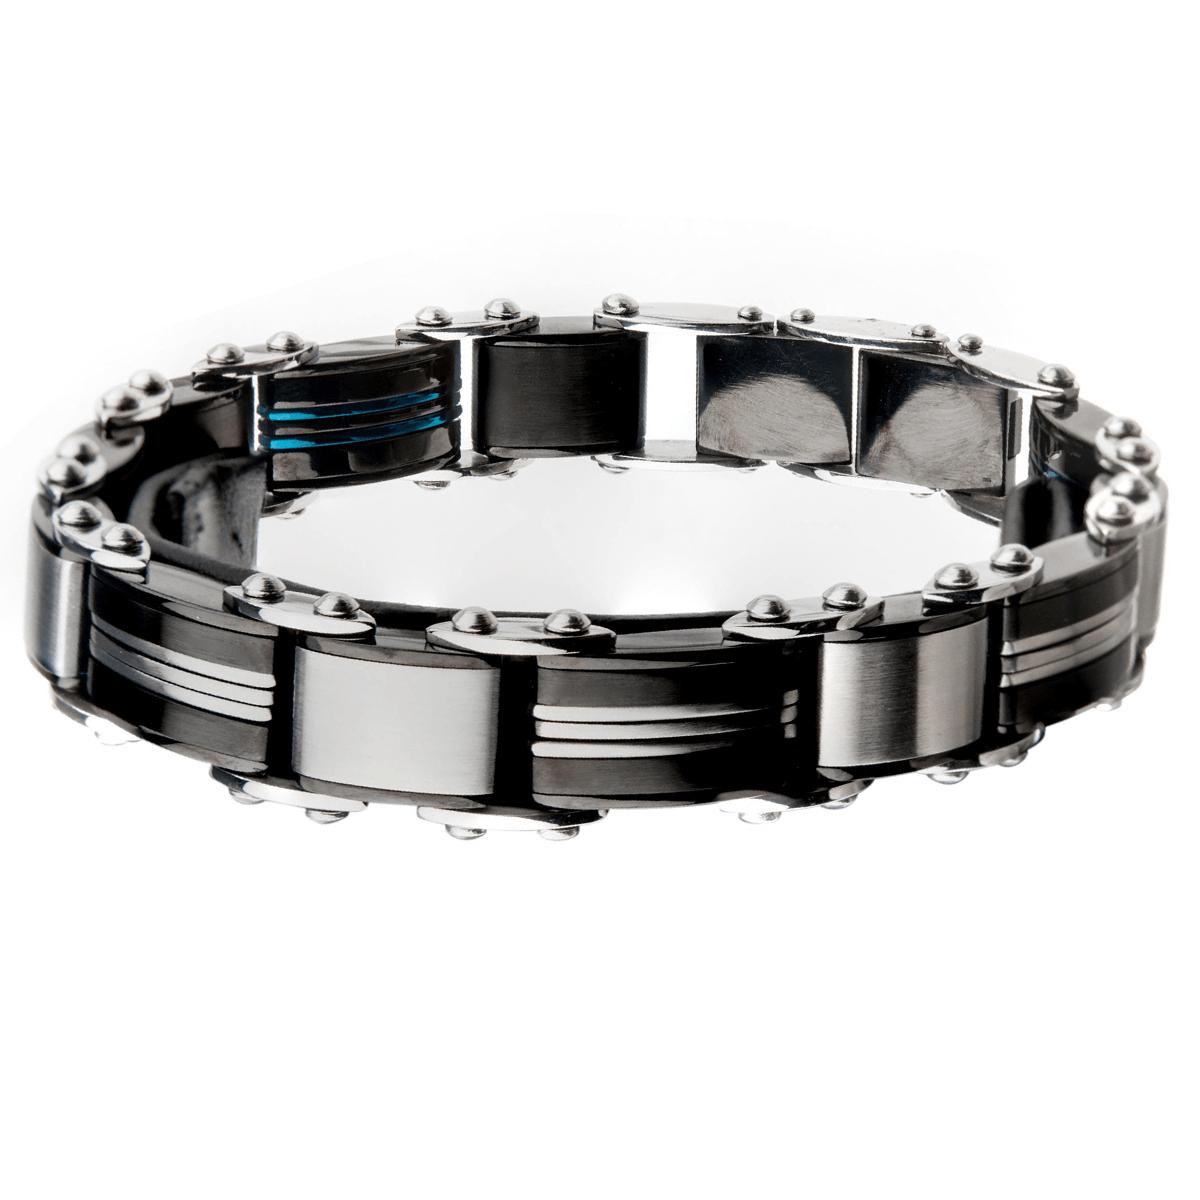 Blue Stripe Carbon Fiber Black Stainless Steel Modern Mens Bracelet In 2020 Black Steel Bracelet Stainless Steel Bracelet Men Link Bracelets